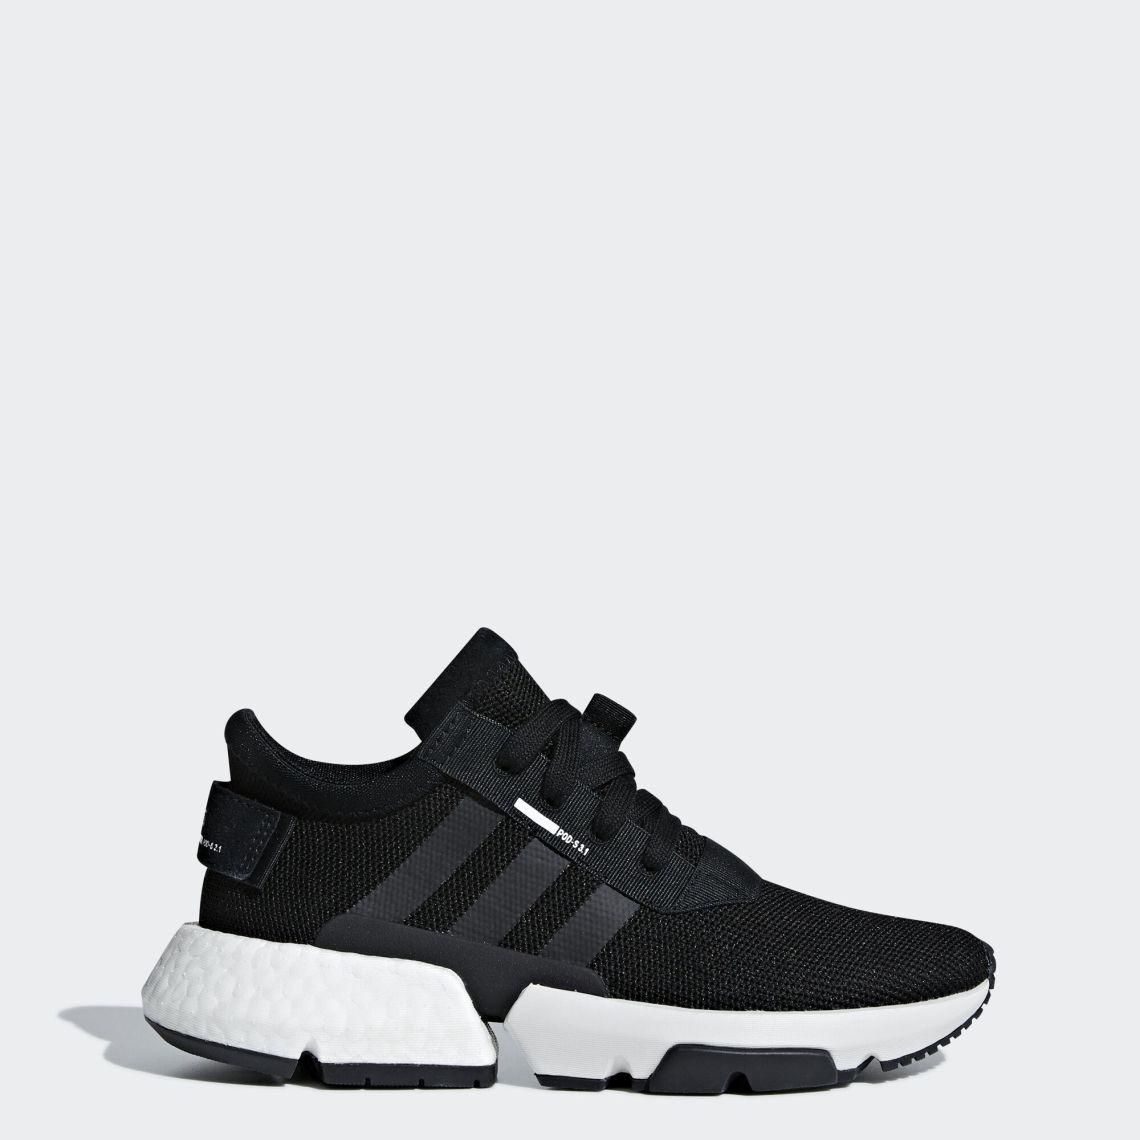 Adidastrackidsp 006 3